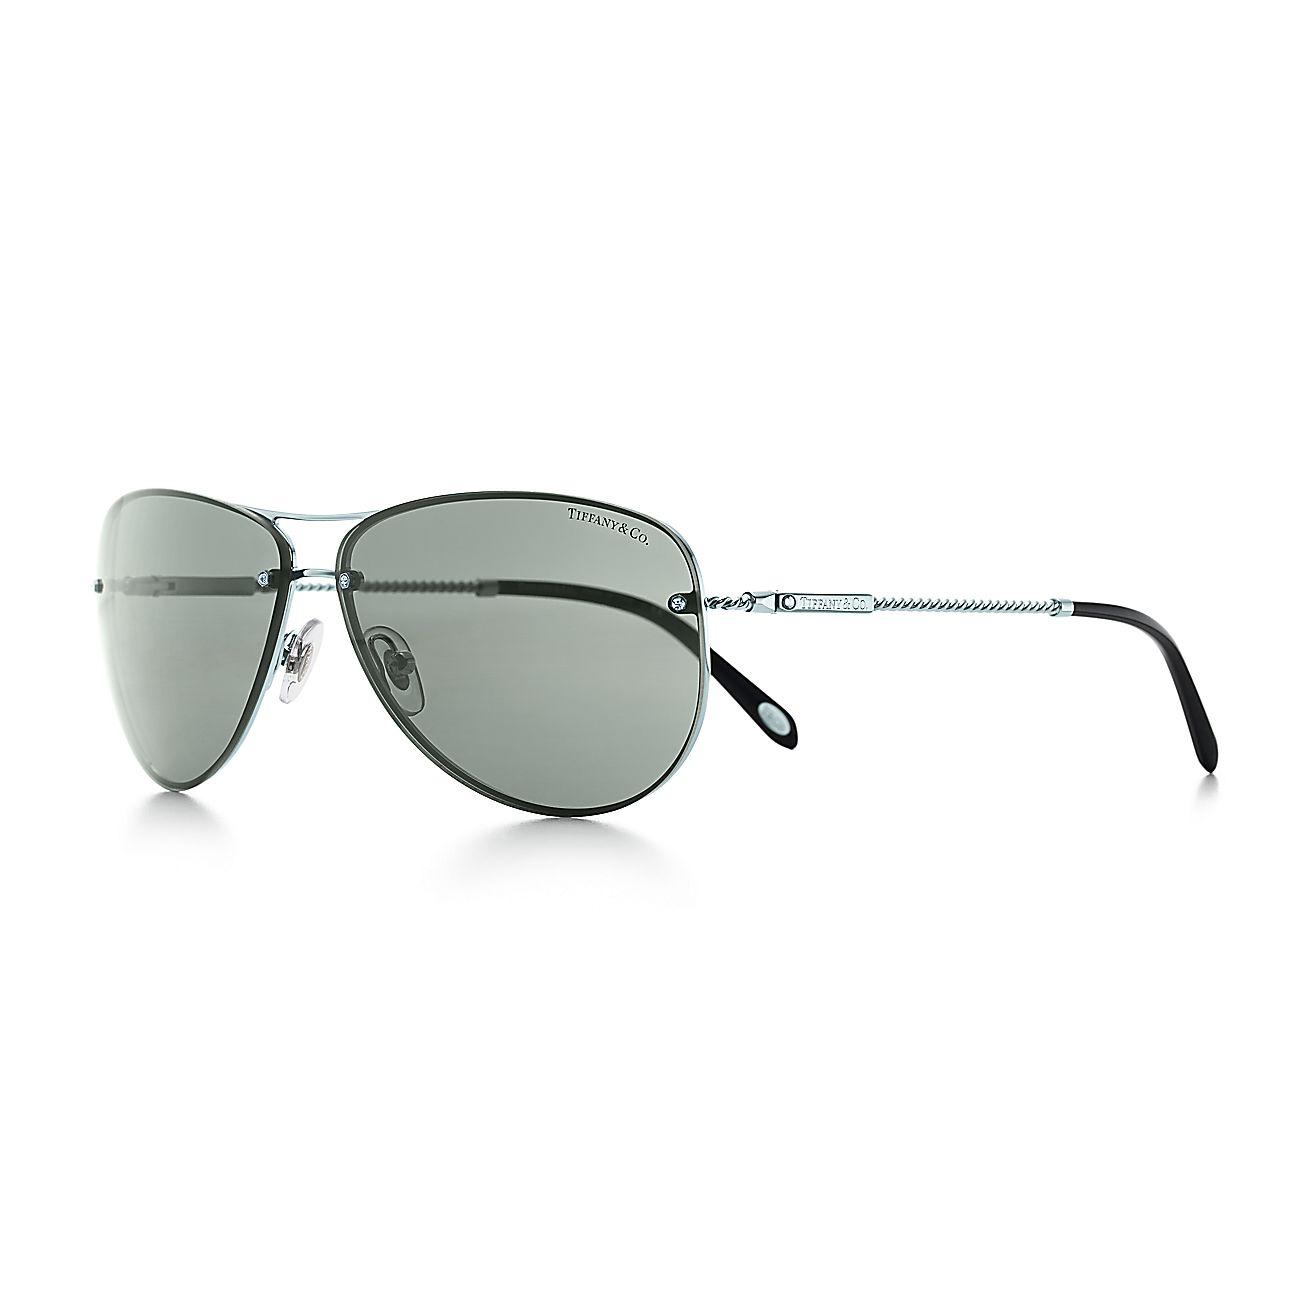 Tiffany Twist:Aviator Sunglasses